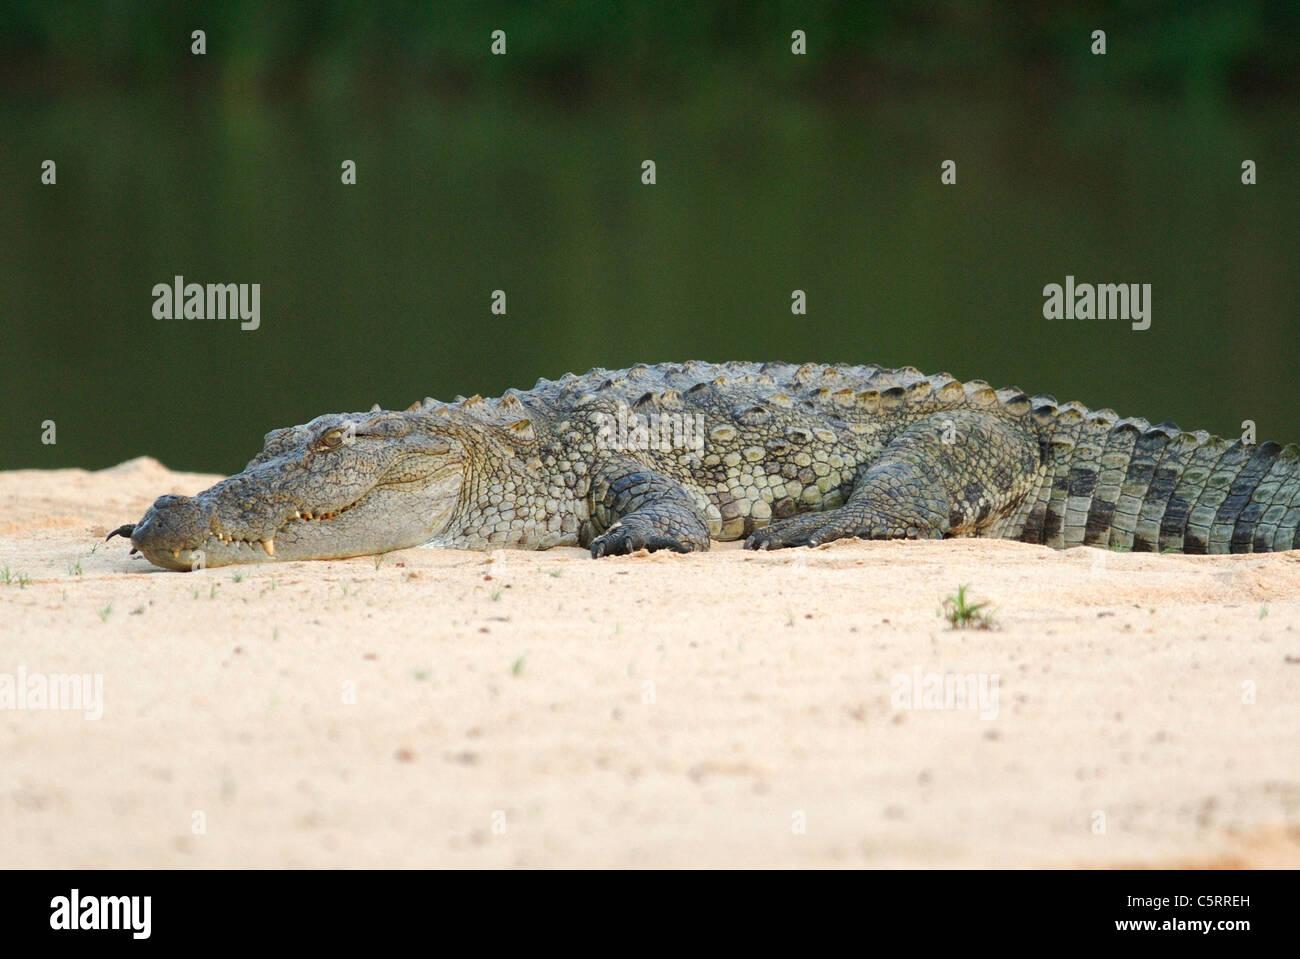 Mugger Crocodile (Crocodylus palustris) aka Marsh Crocodile, in Yala West National Park, Sri Lanka Stock Photo